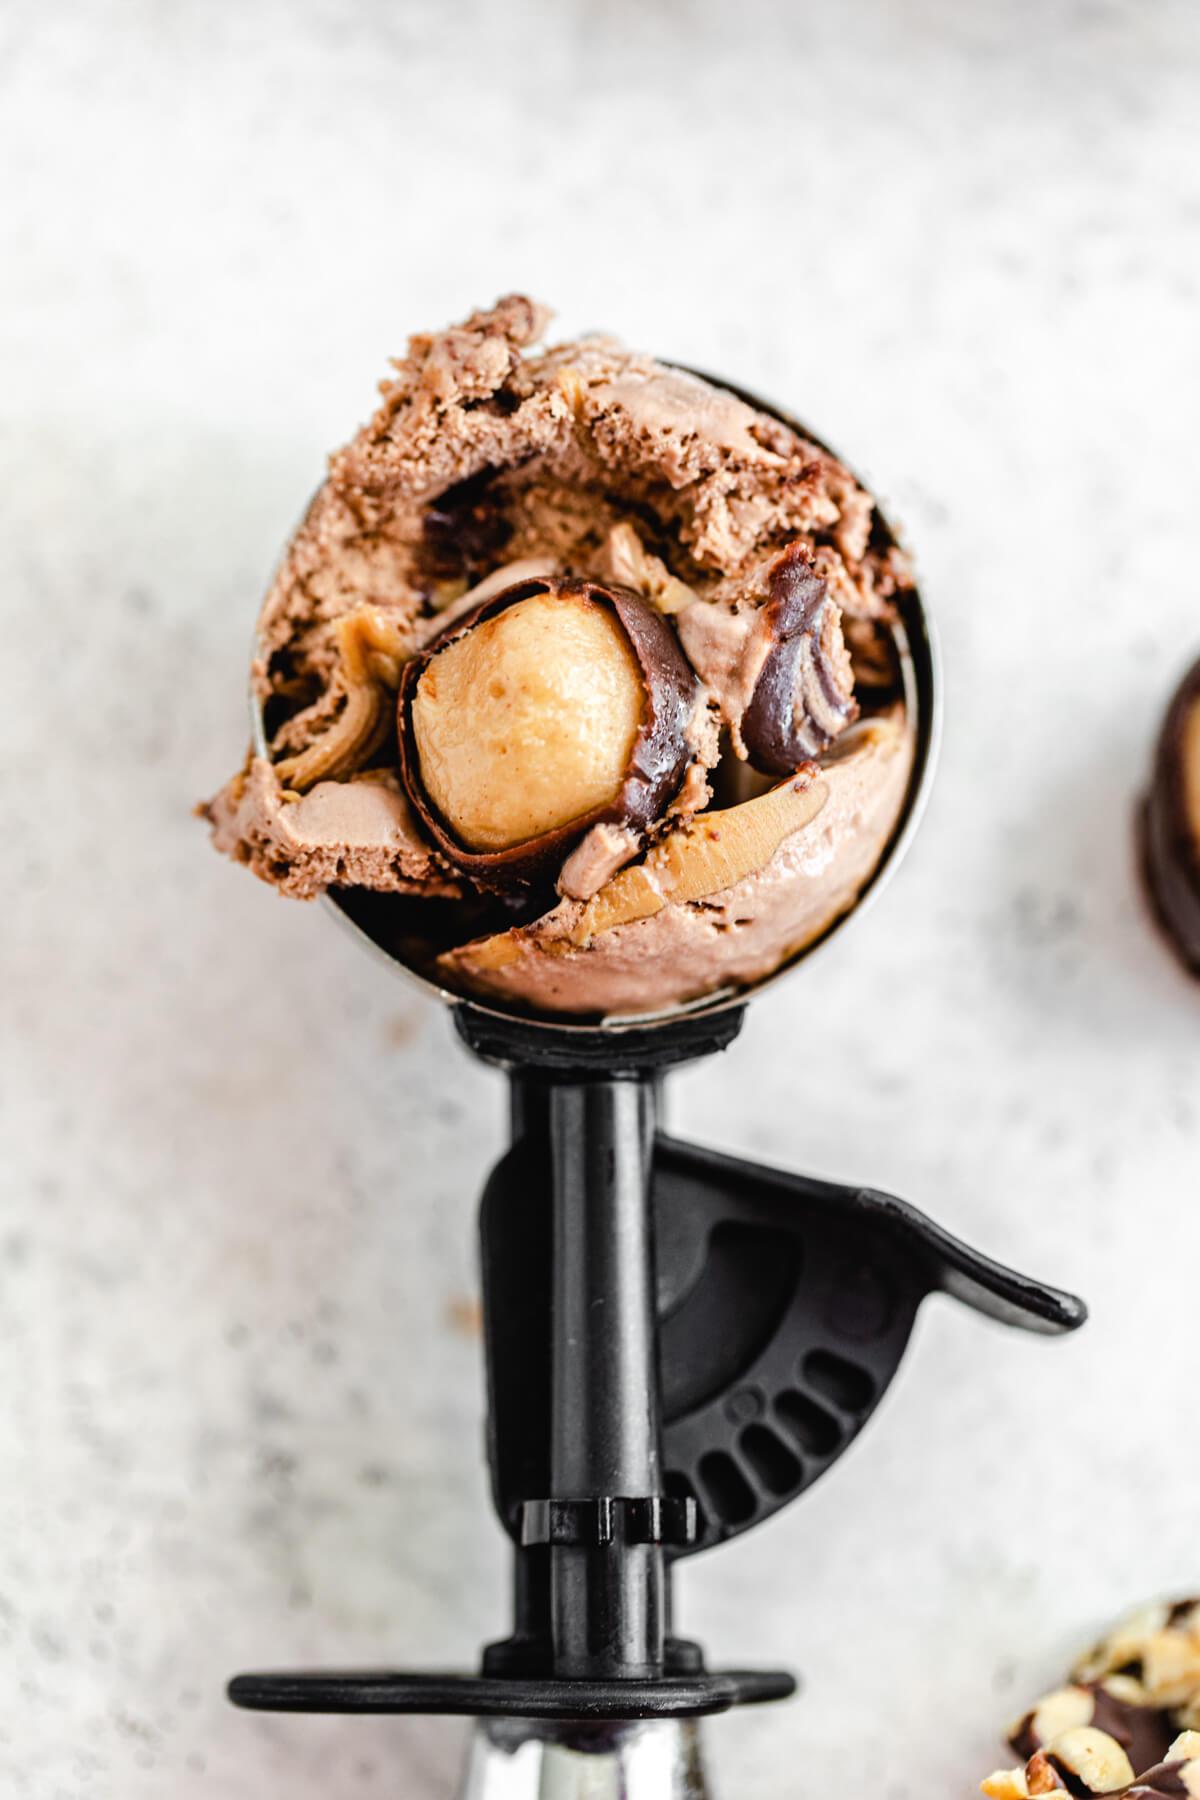 ice cream in an ice cream scoop